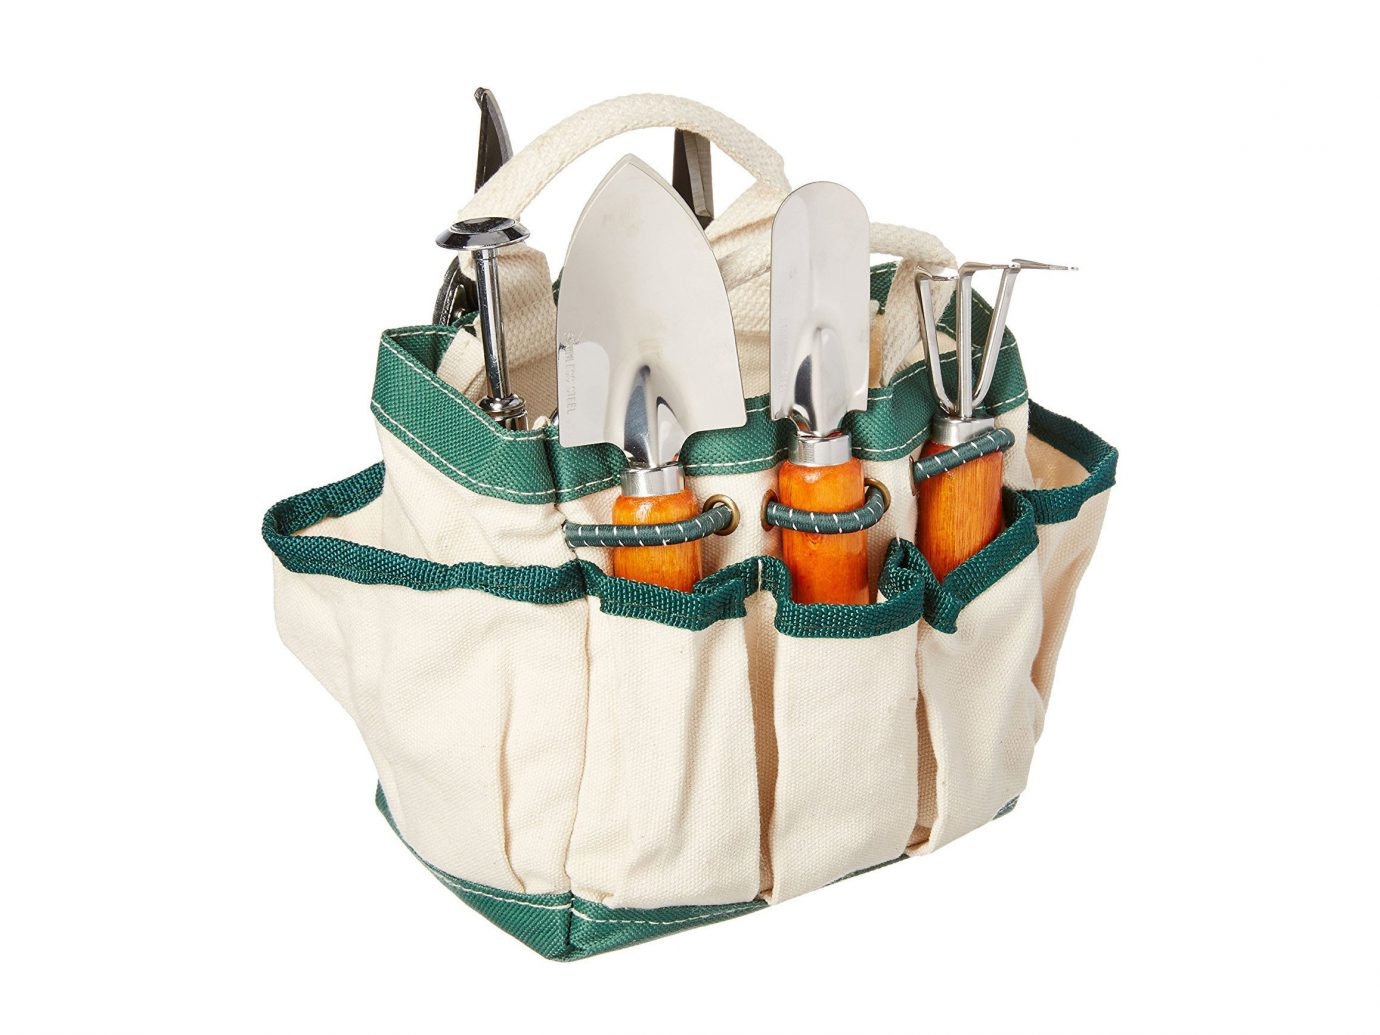 Style + Design handbag bag product fashion accessory decorated